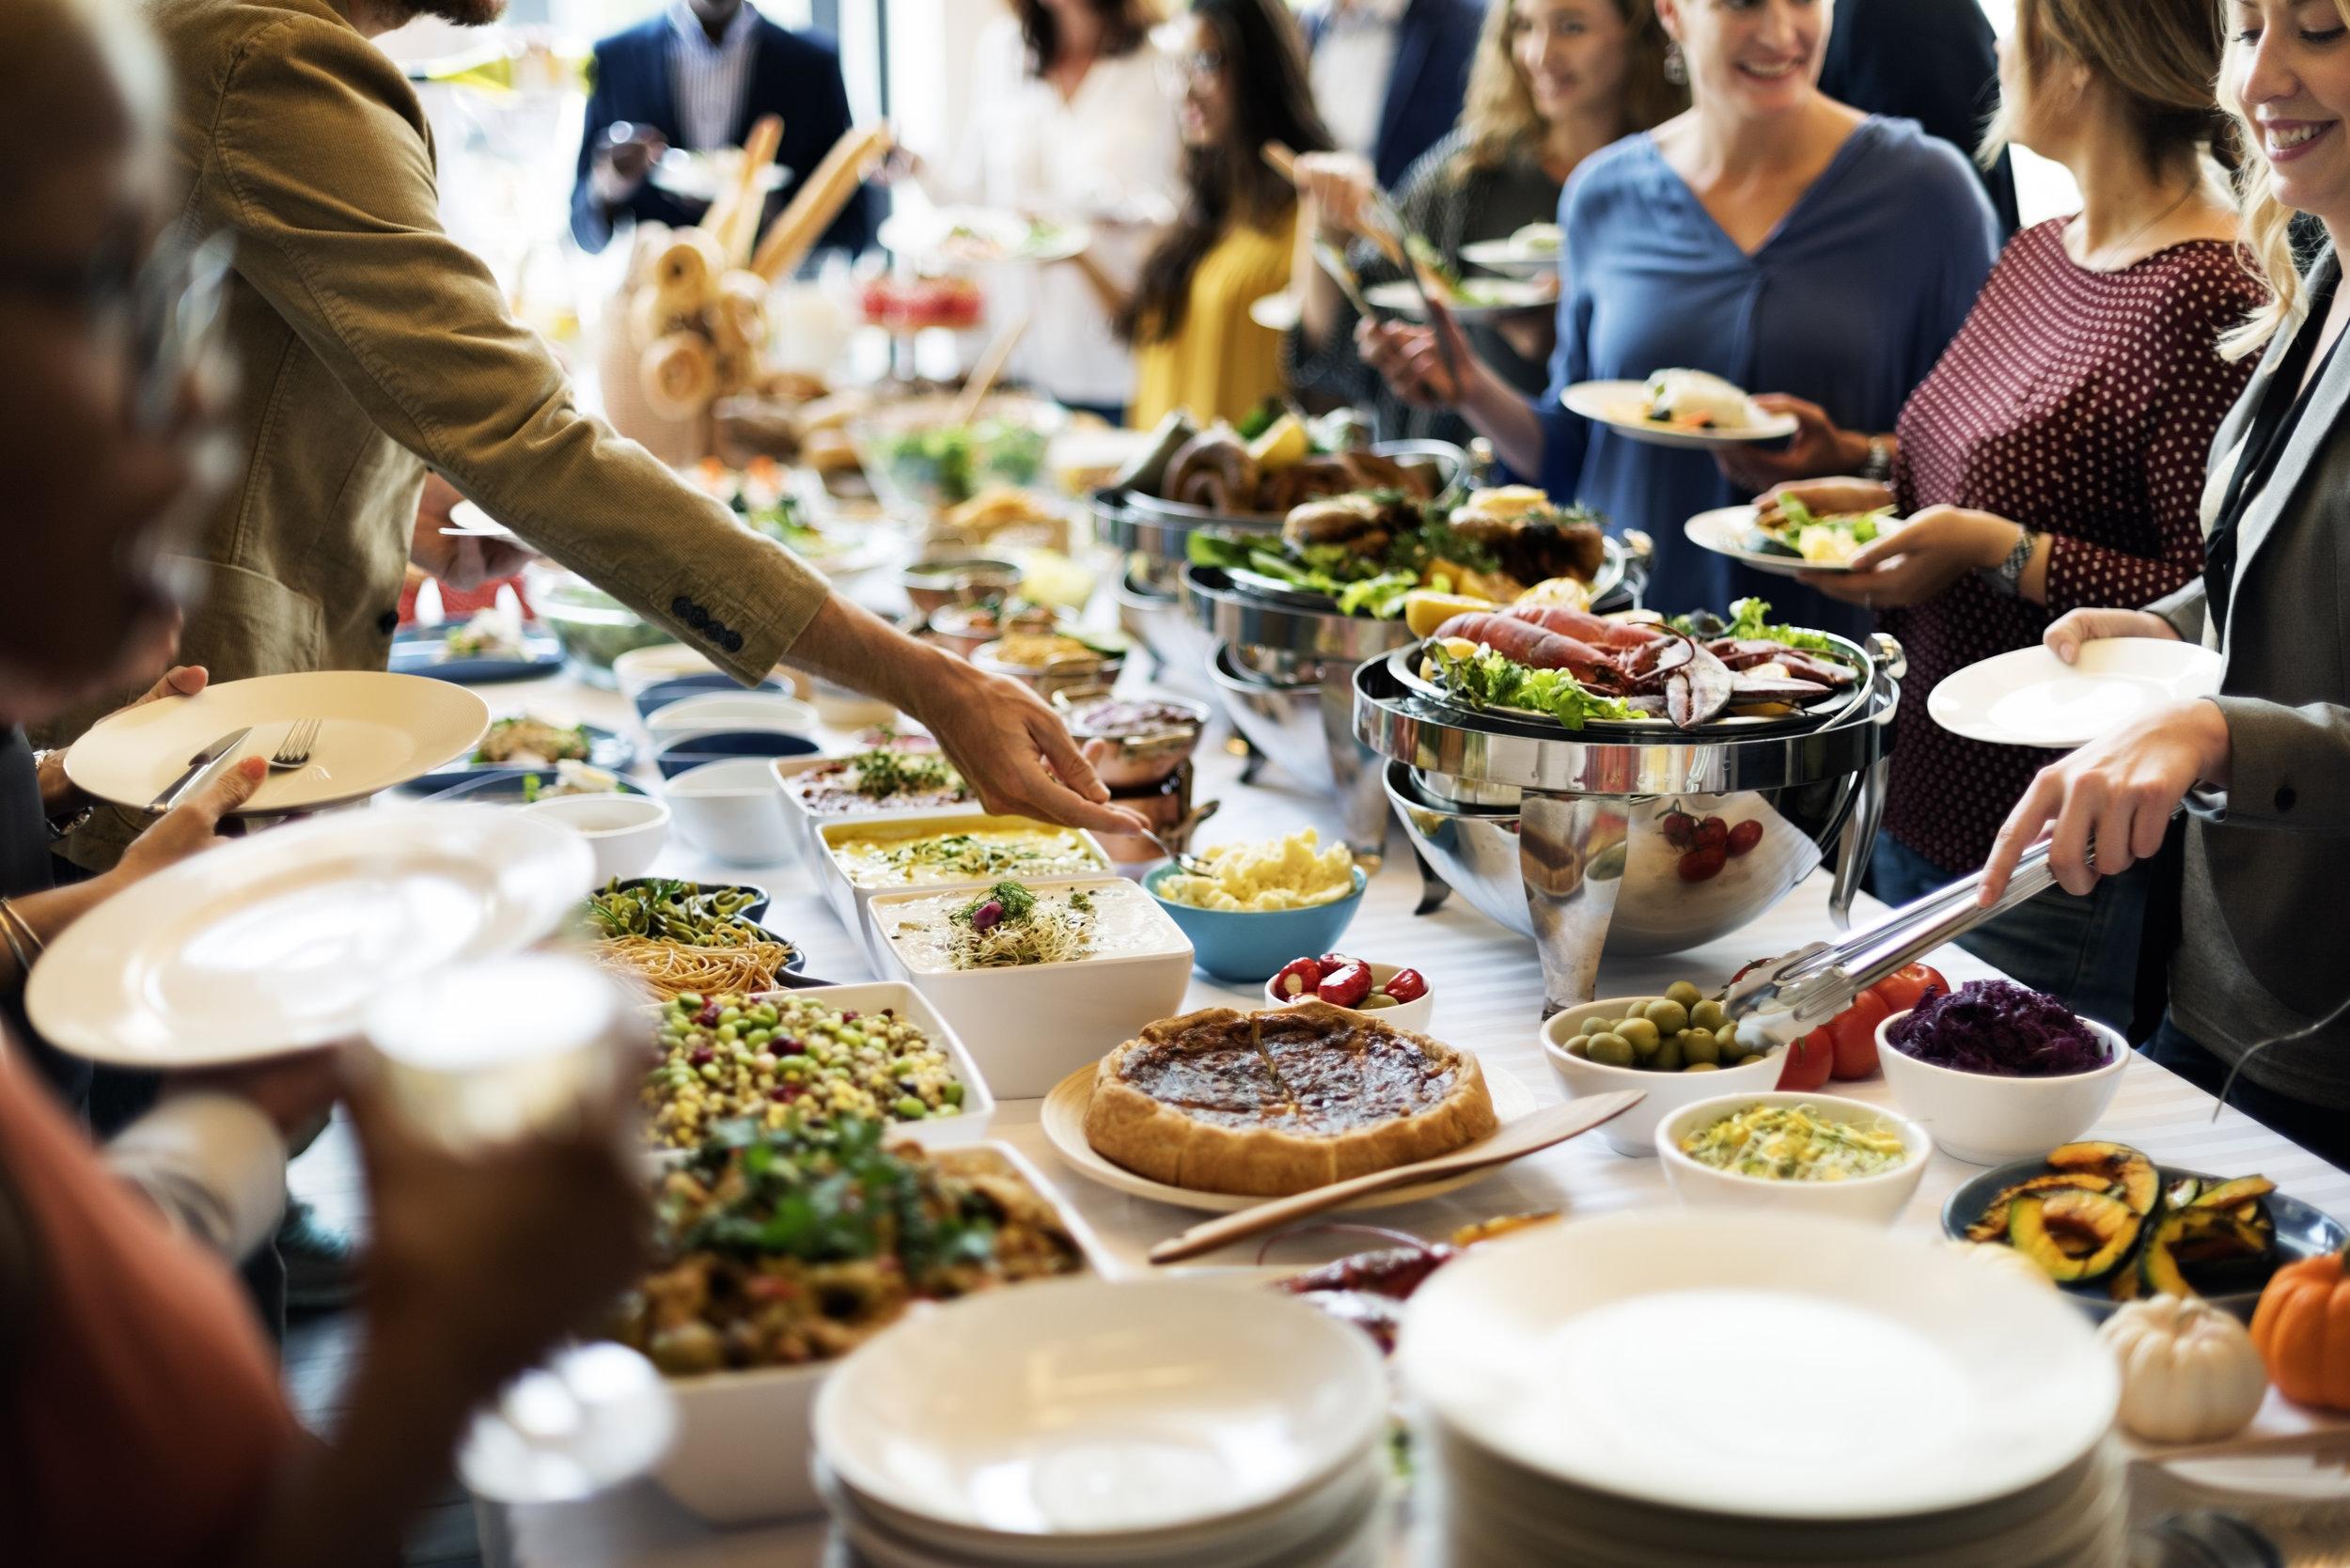 bigstock-Food-Buffet-Catering-Dining-Ea-118592123.jpg